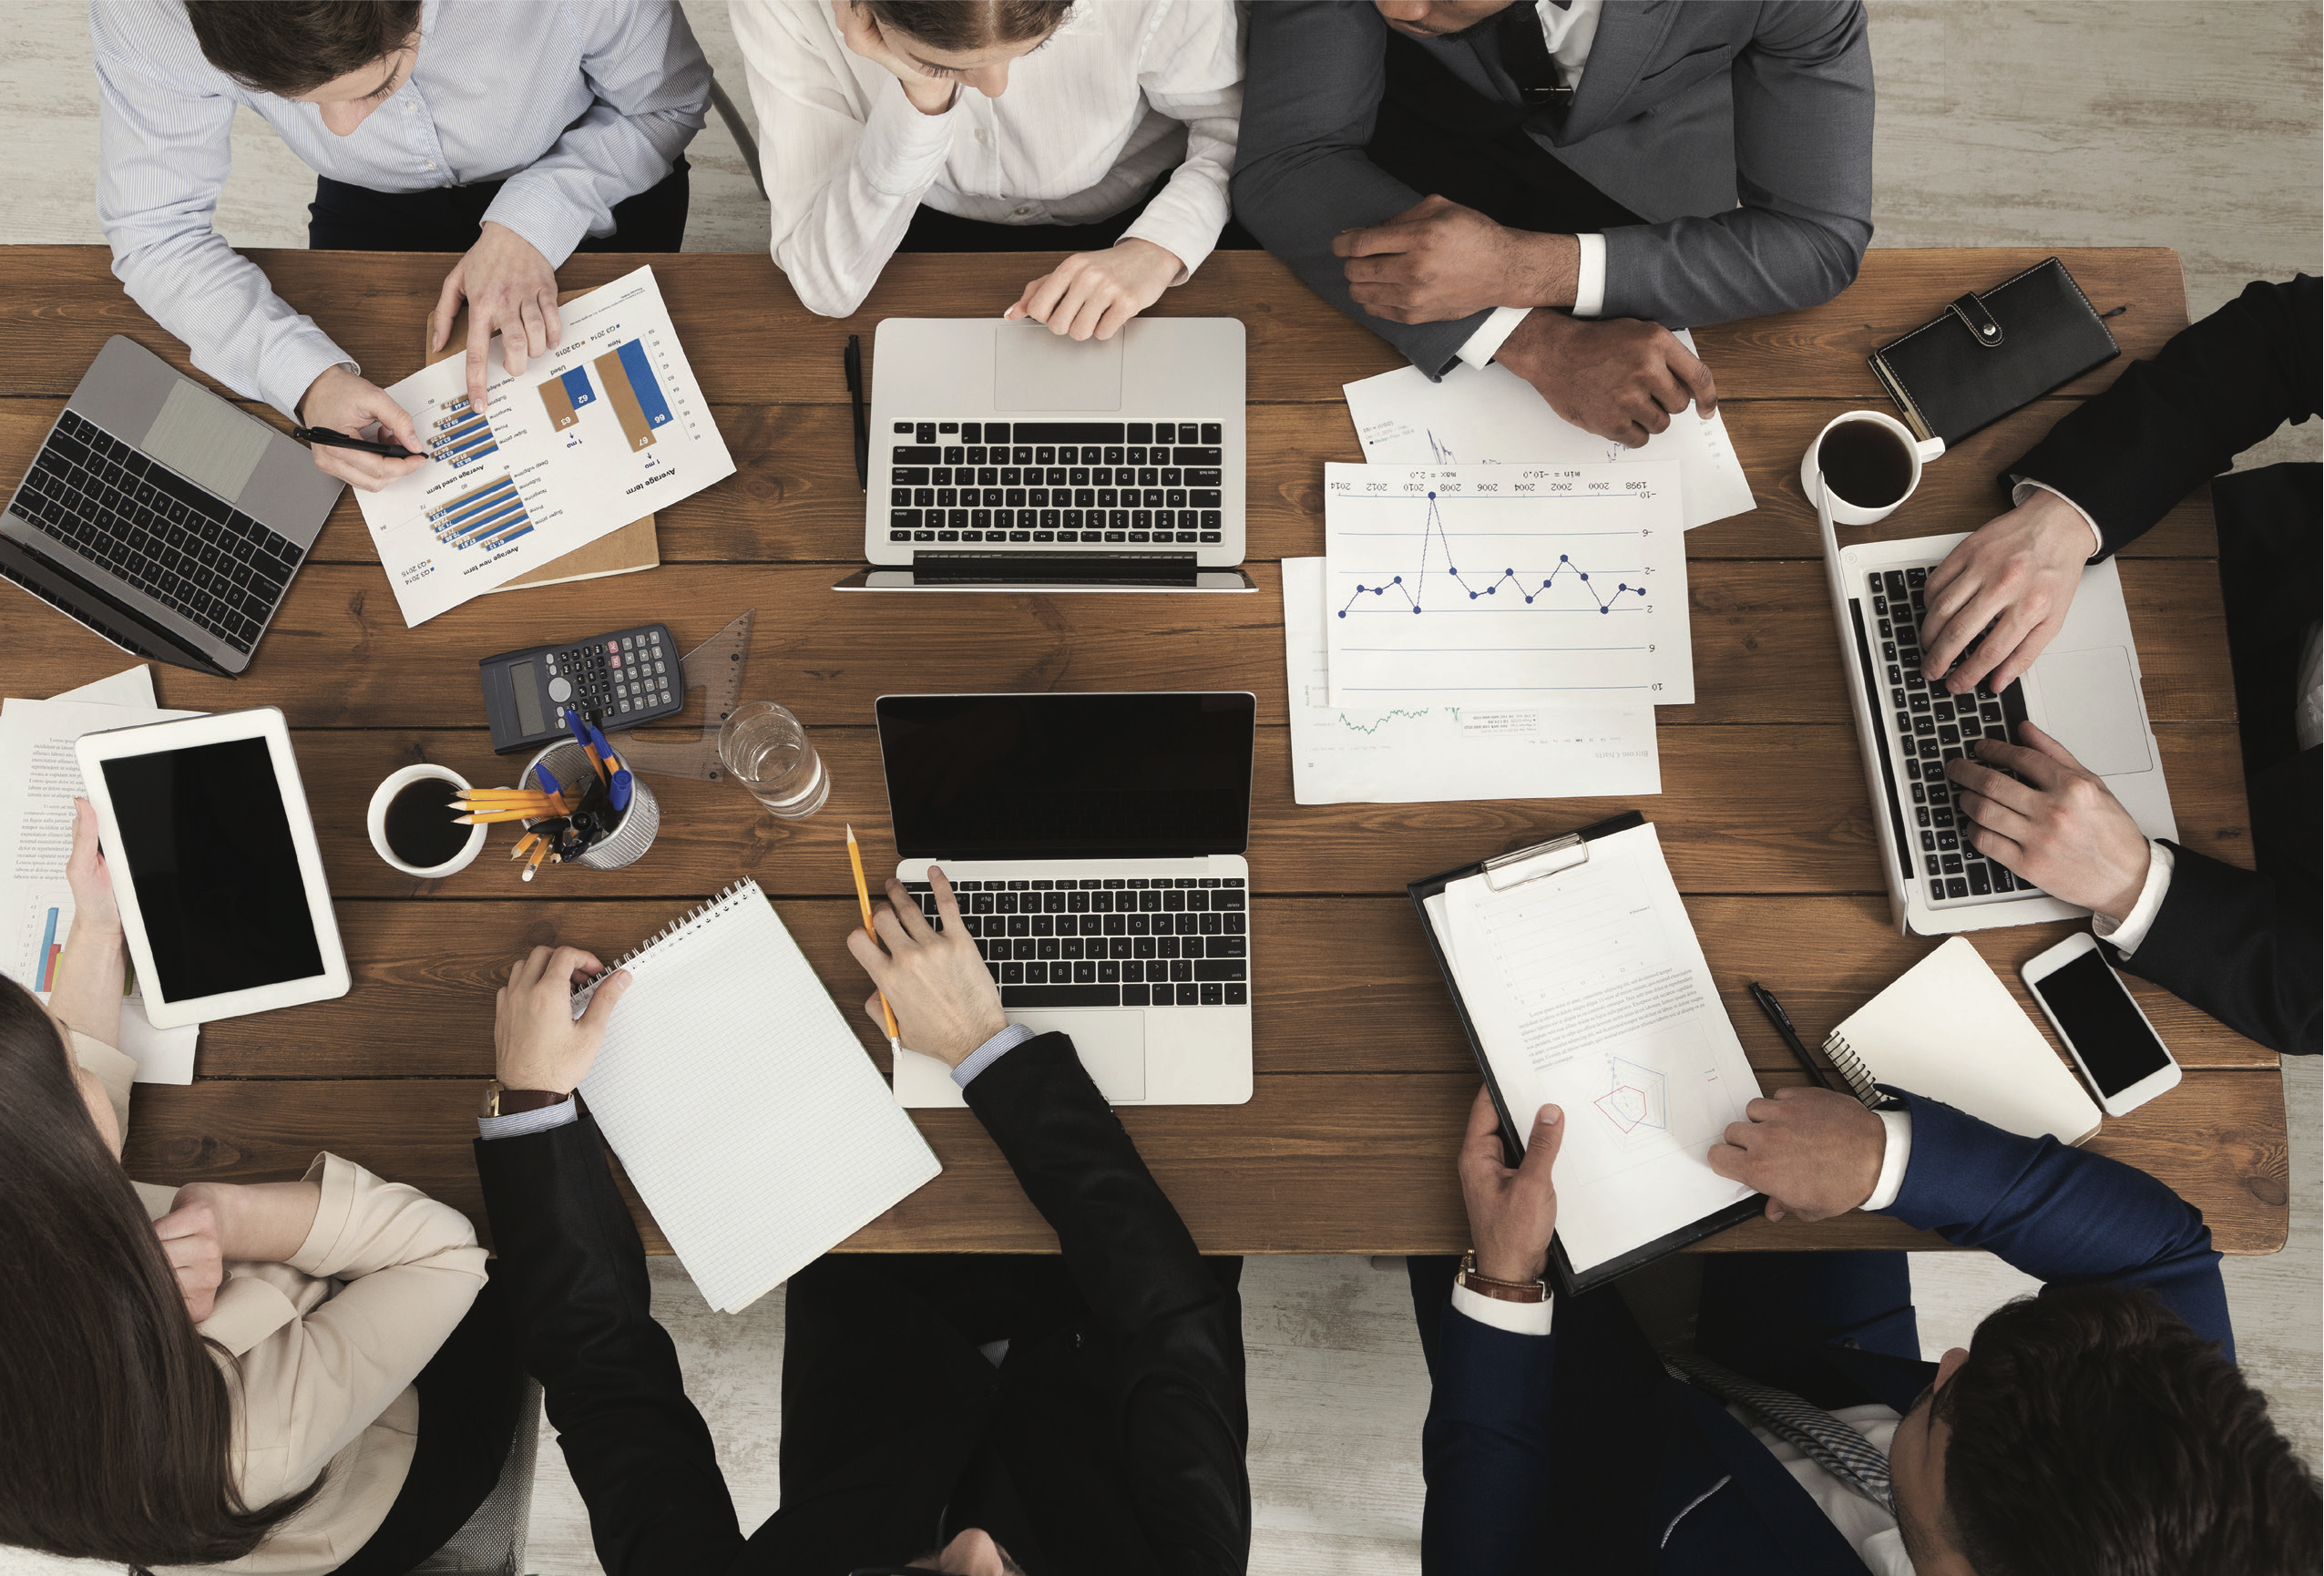 BKM Marketing | Bank Merger Communications - Excelling Through Change | ebook